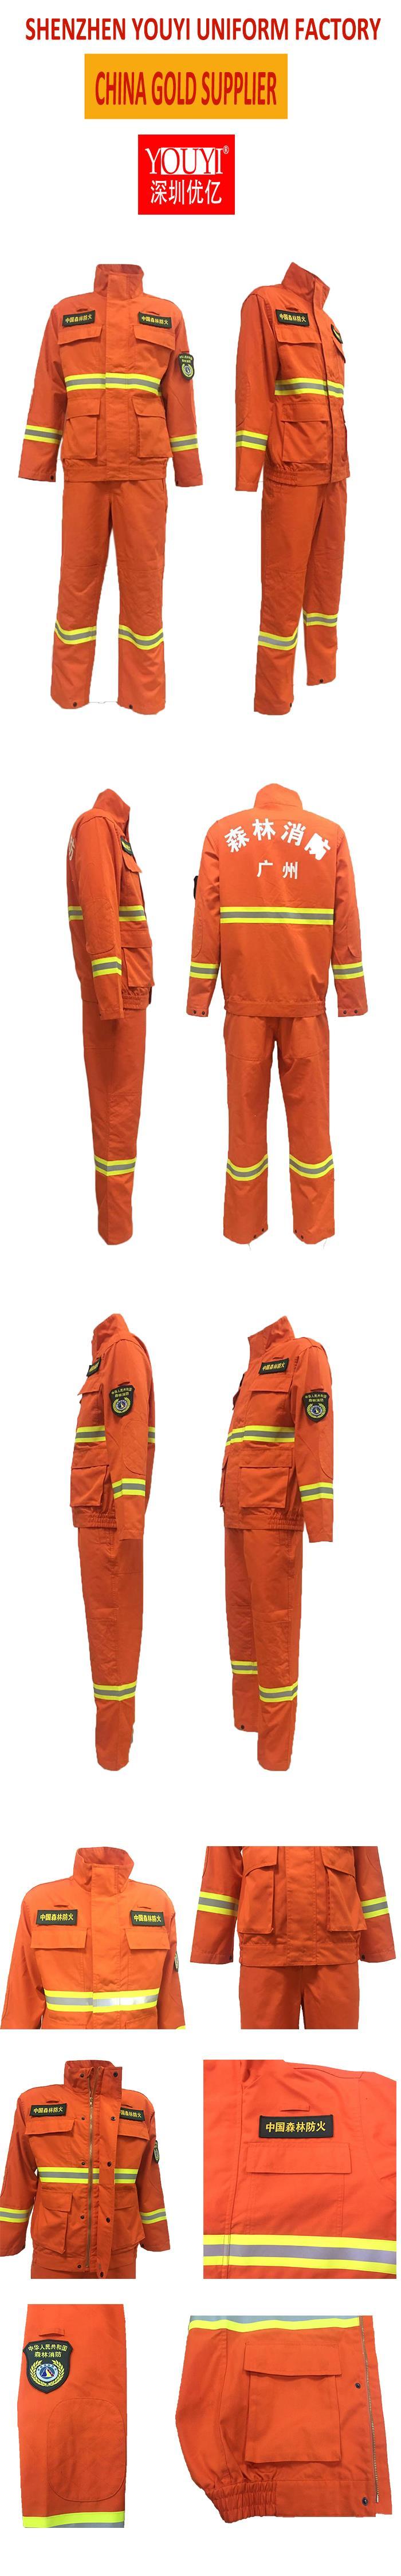 požiarny oblek 详情 描述 图